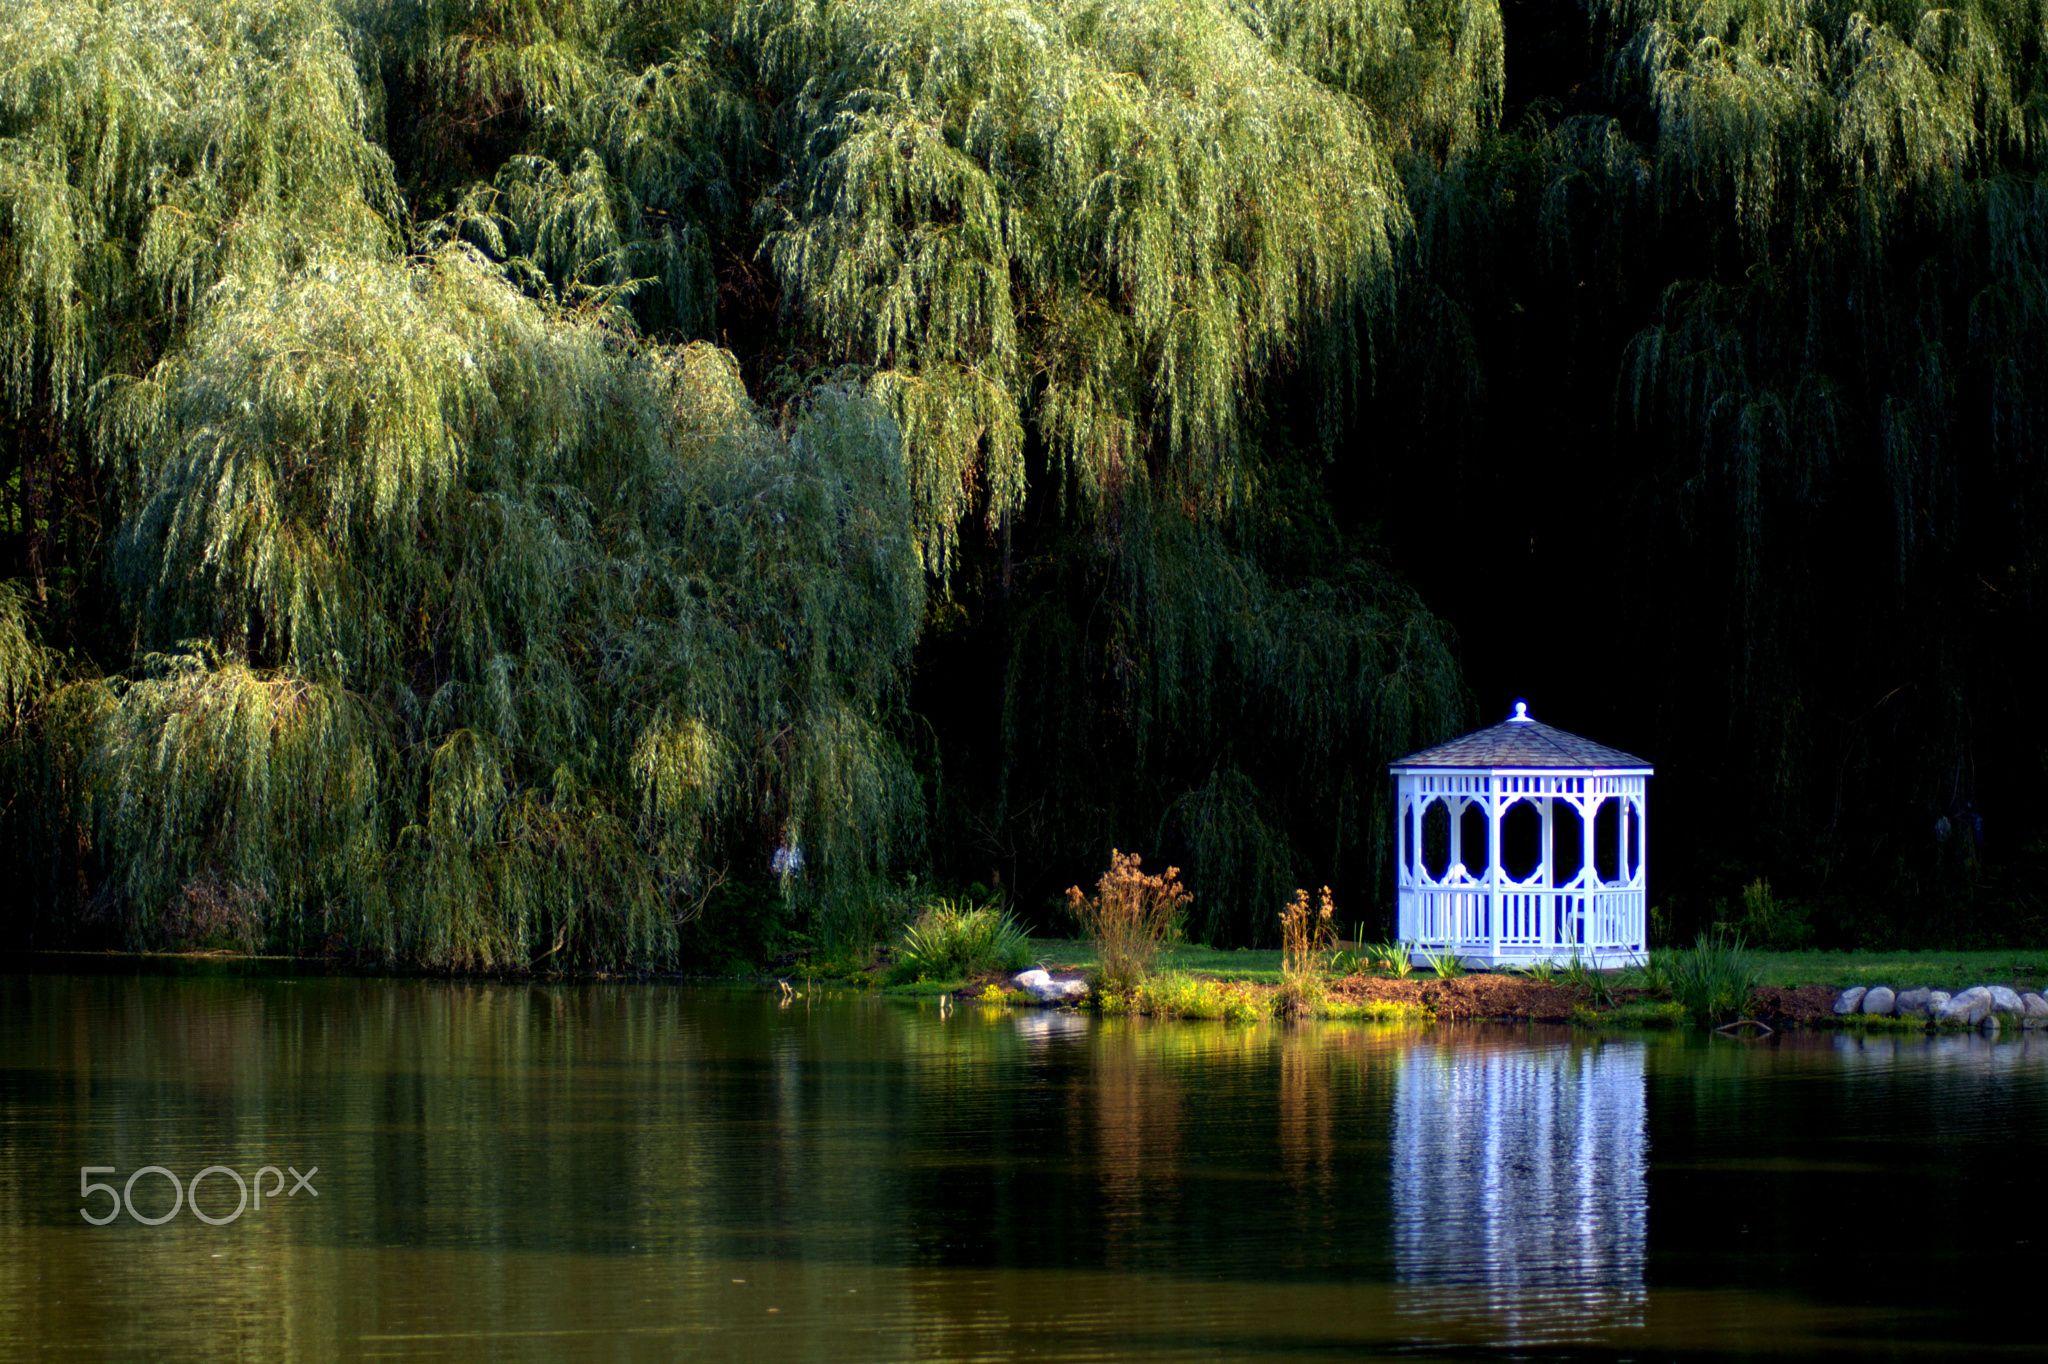 Lake Lucerne Friendship Botanic Gardens Michigan City Indiana My 500px Pinterest